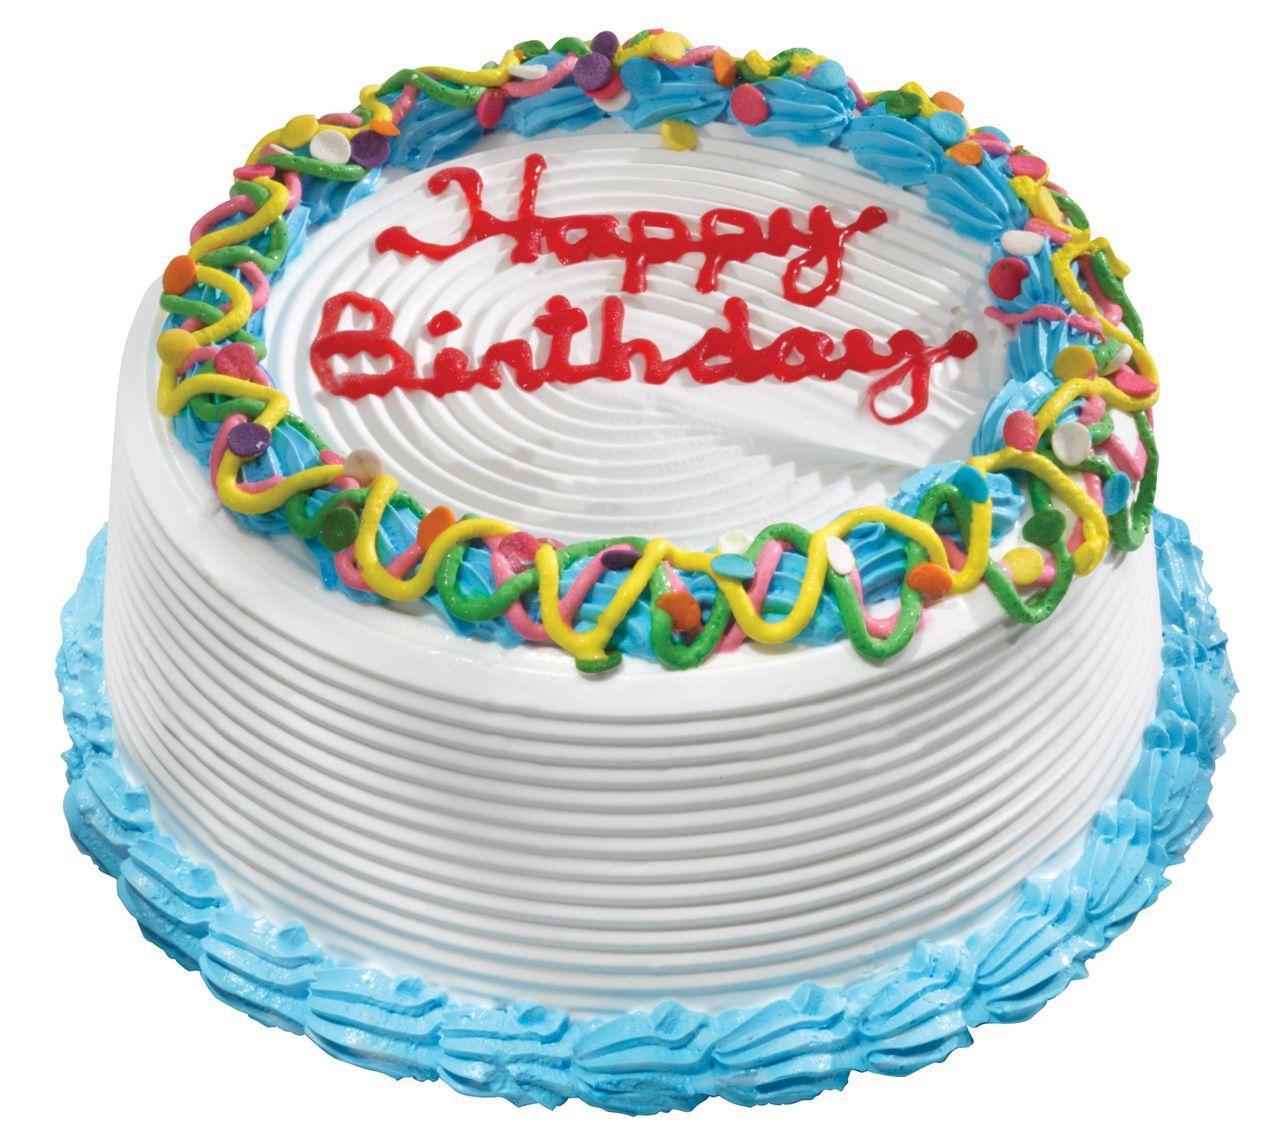 Decoration Ideas for Your Ice Cream Cake Cream cake Cake and